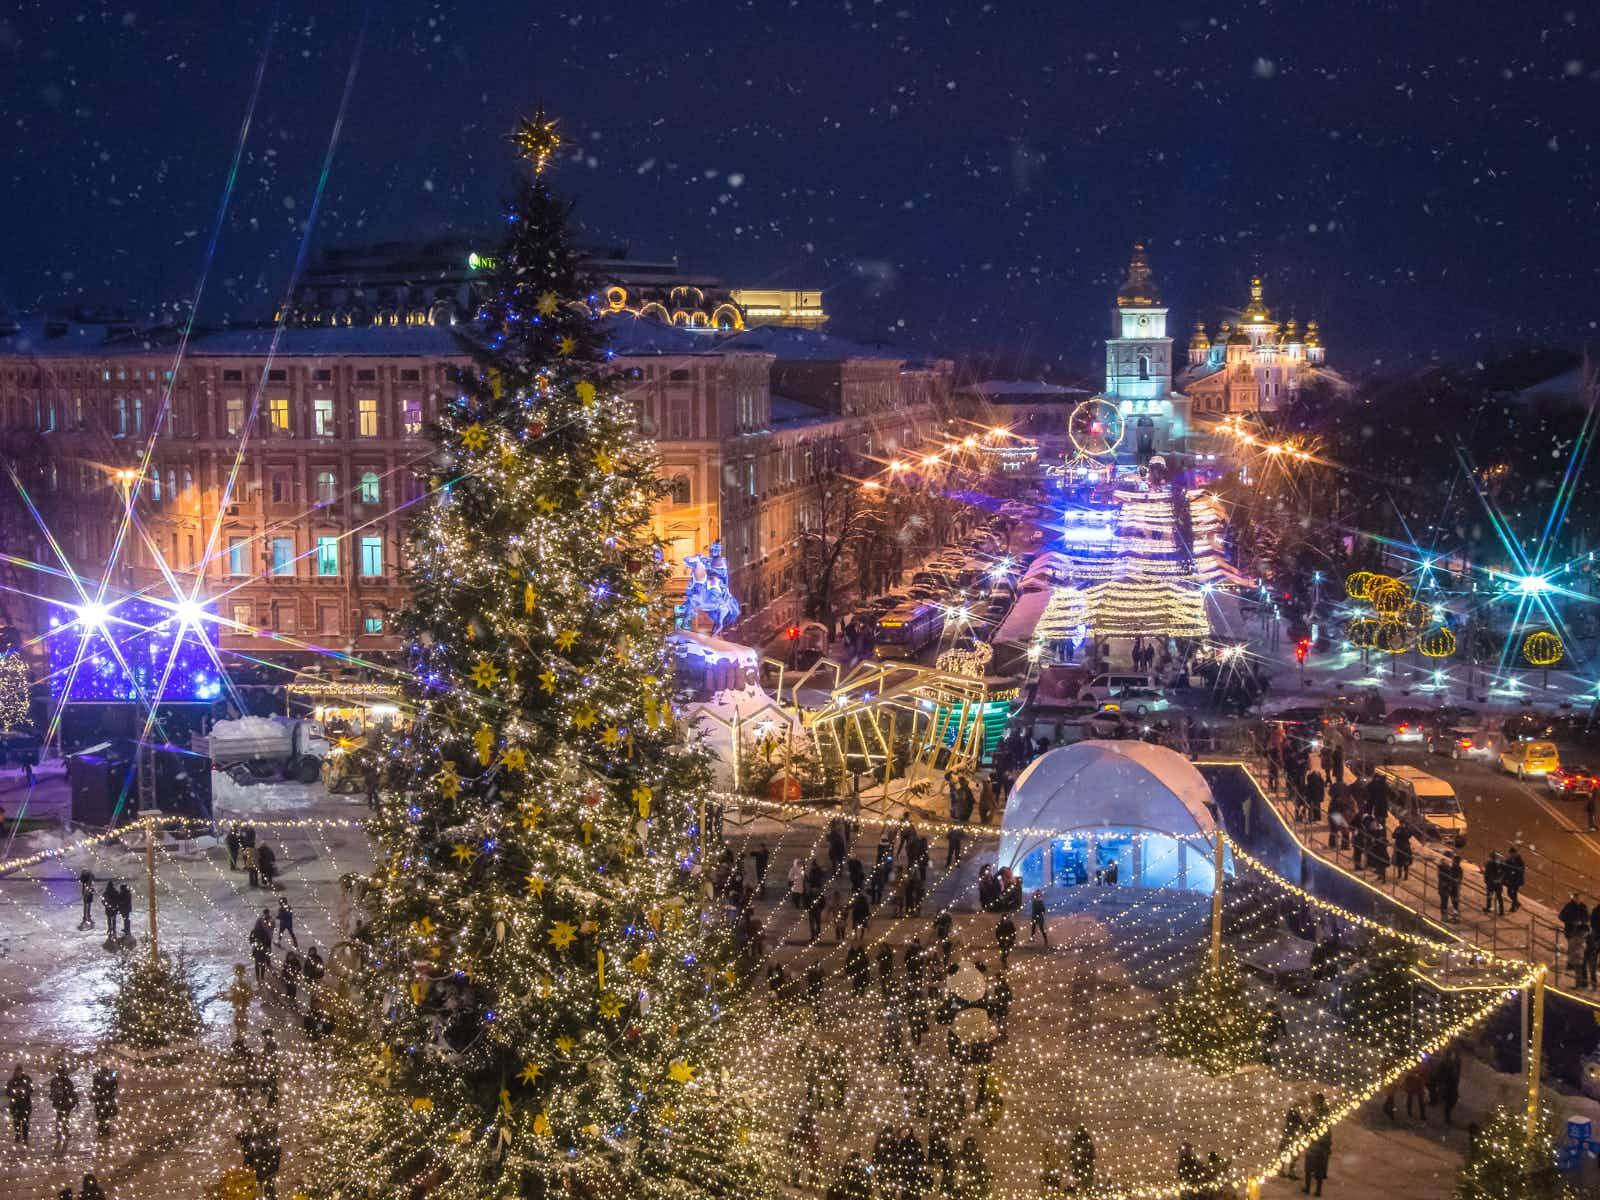 The Christmas fair transforms St Sophia's Square in Kyiv into a winter wonderland © Marianna Ianovska / Shutterstock